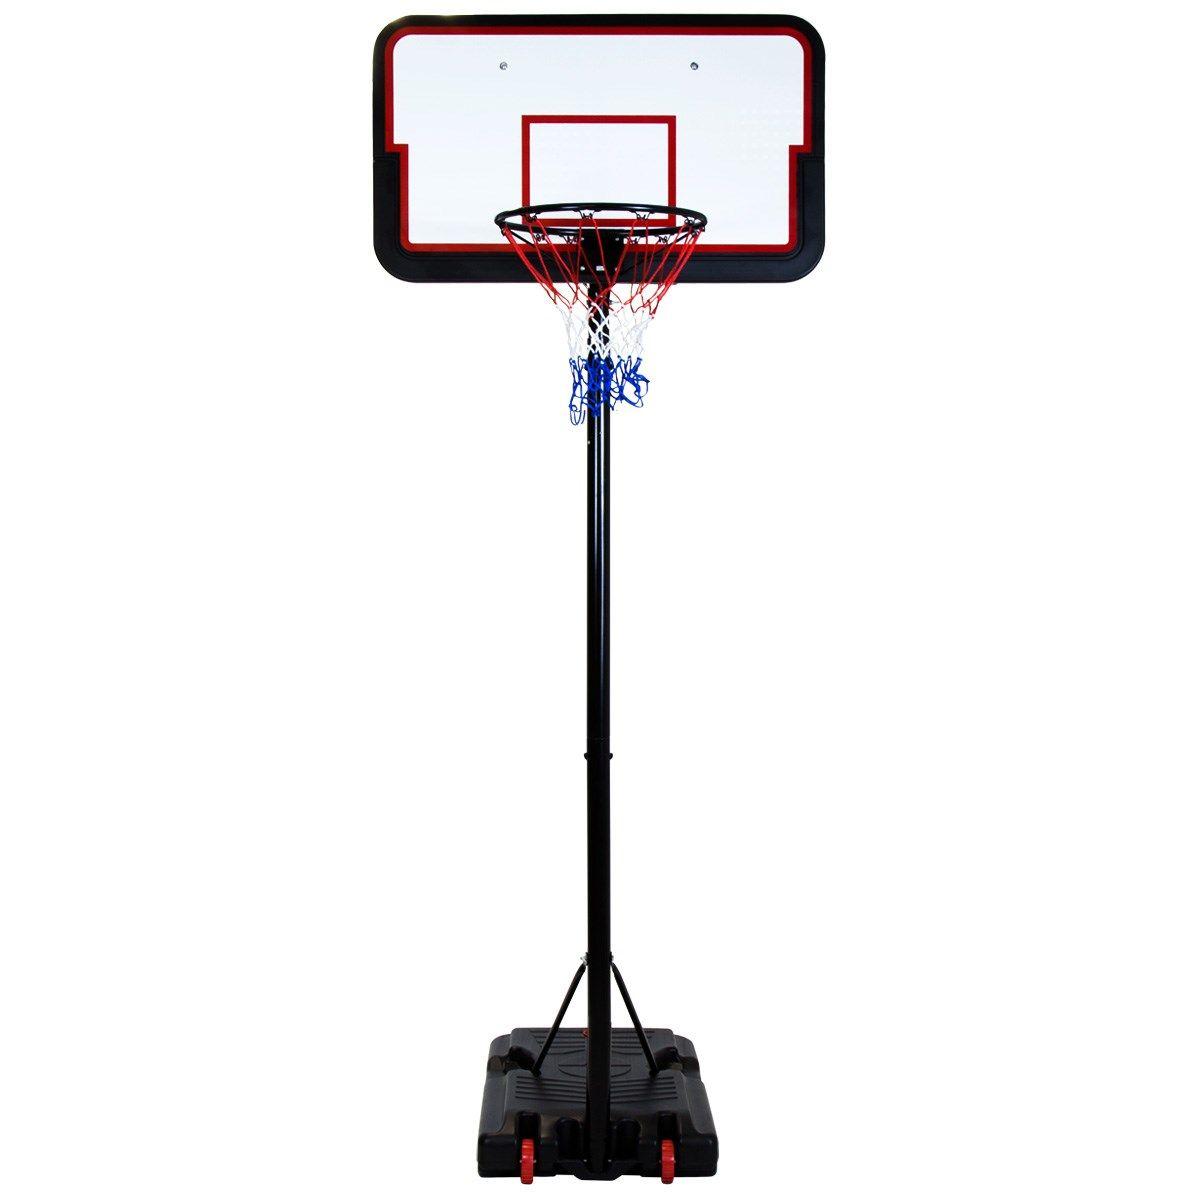 Free Standing Basketball Net Hoop Kids Backboard Adjustable Stand Set Xmas Gifts